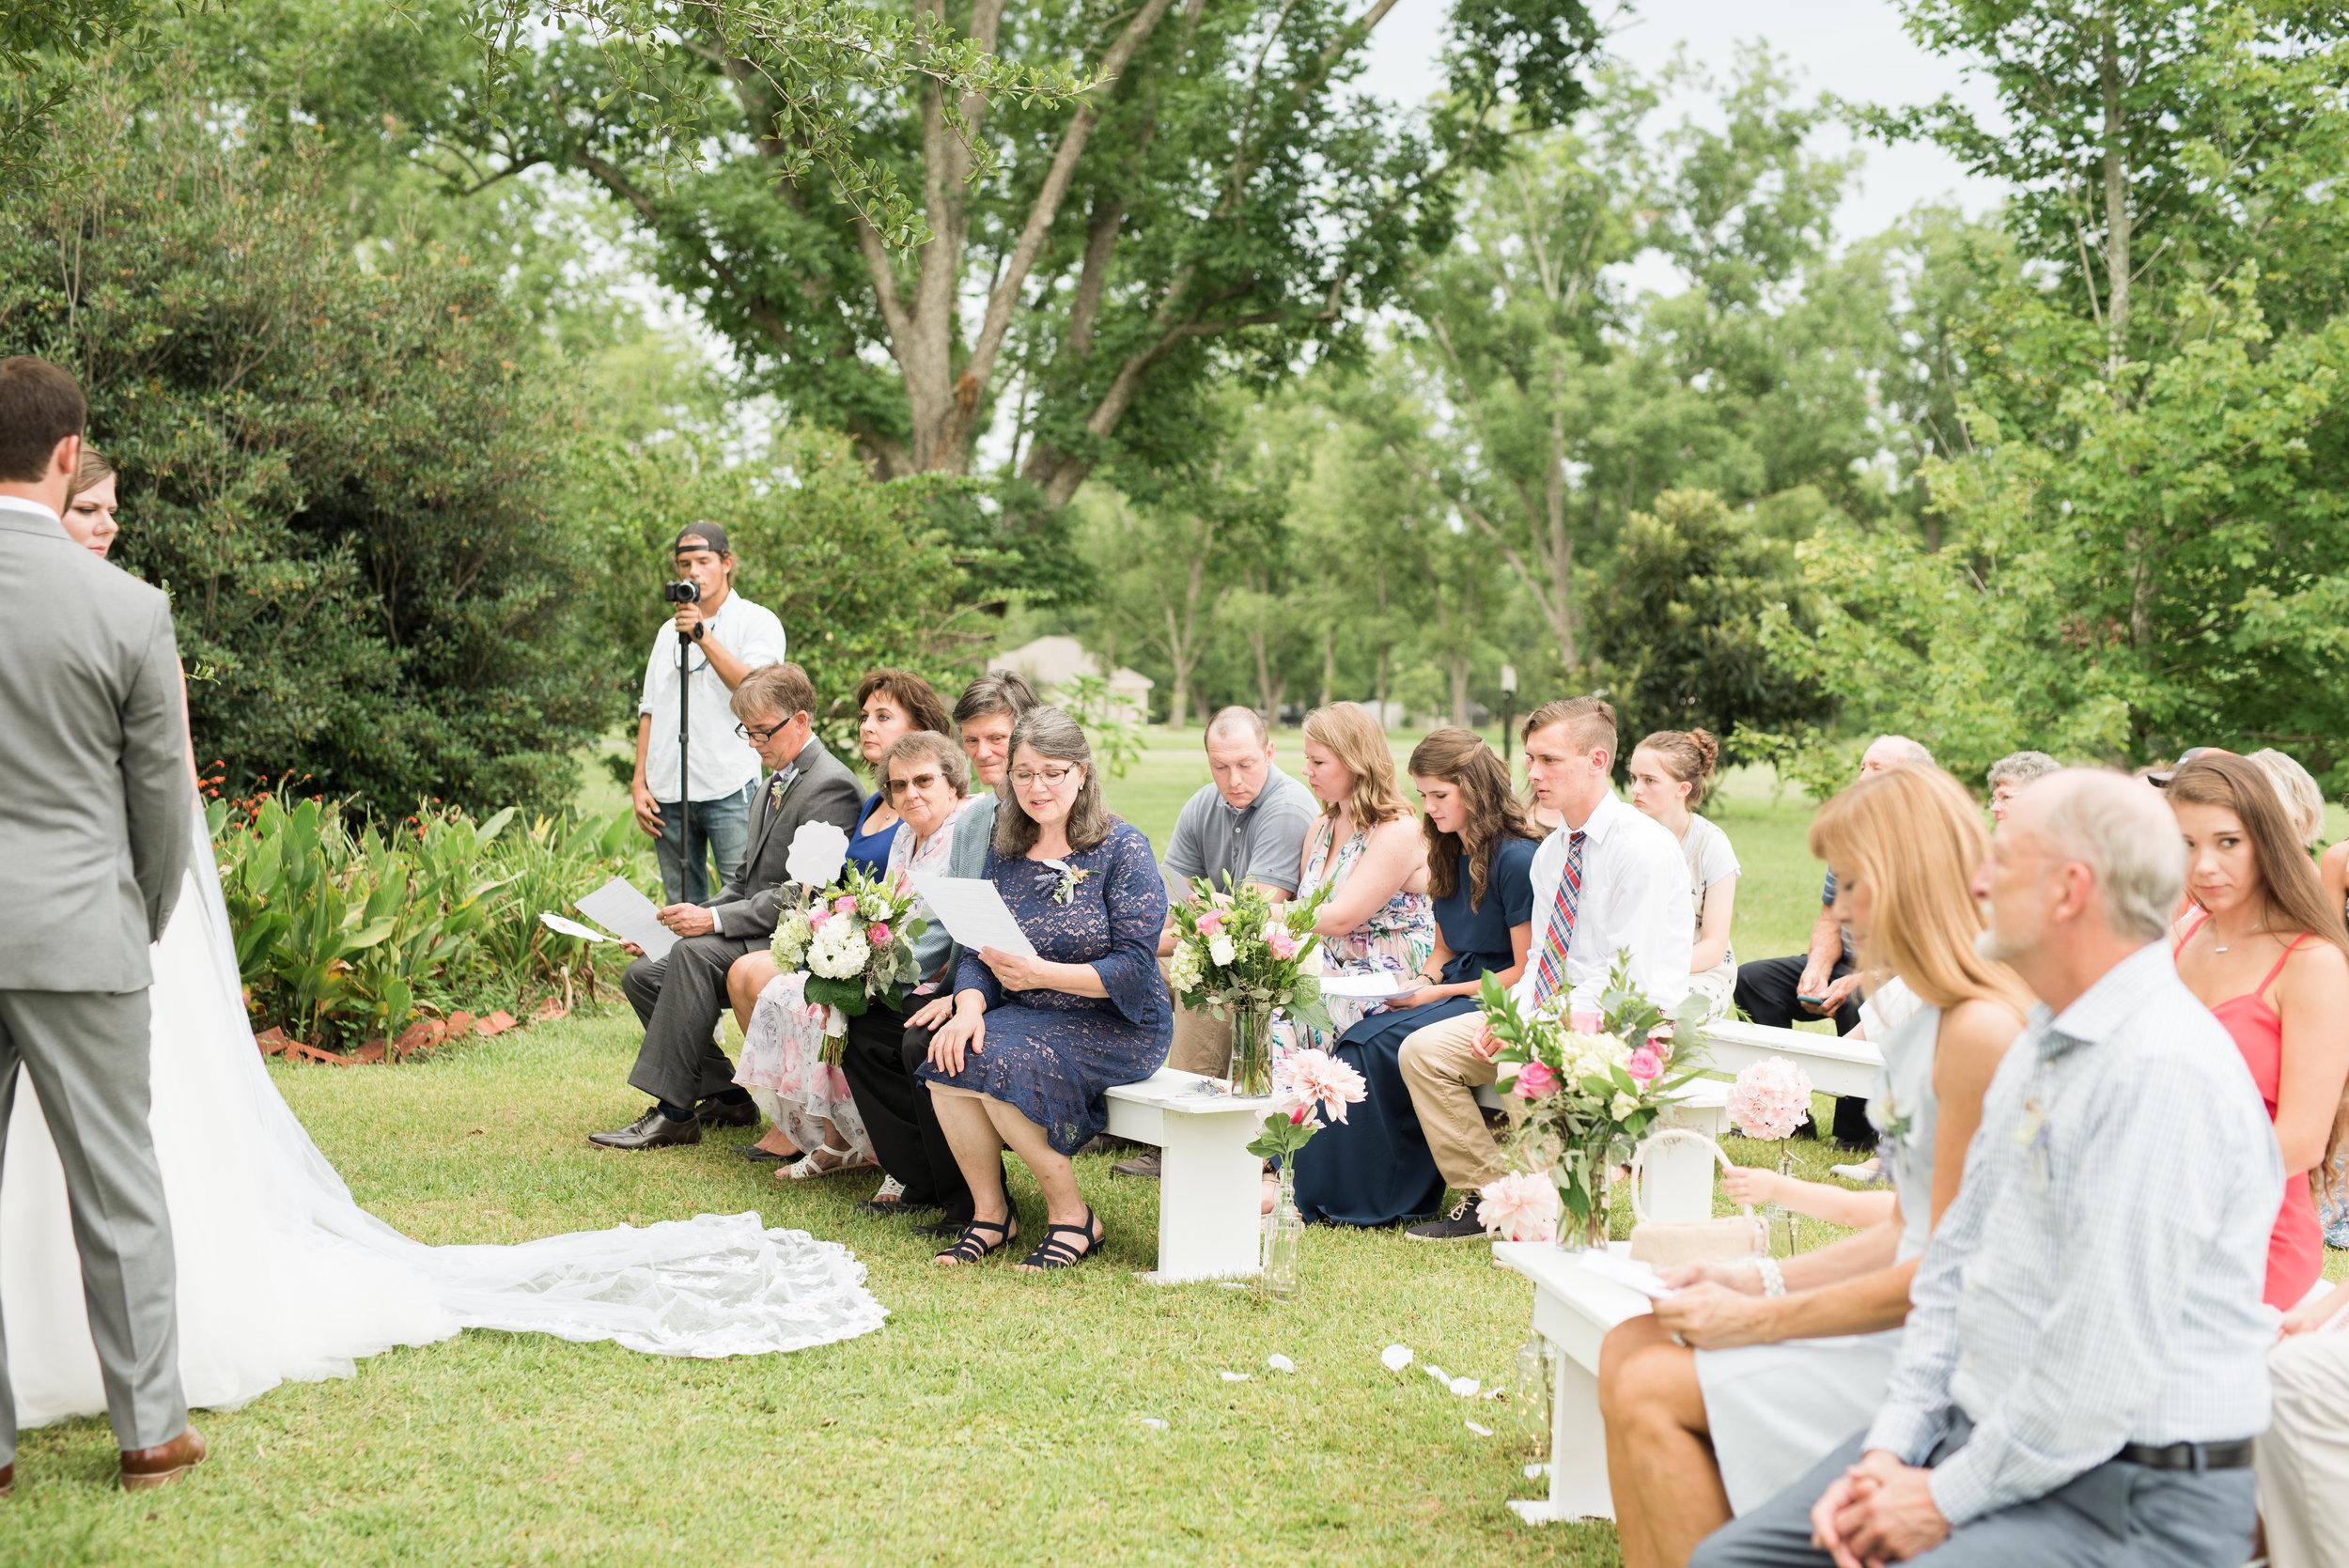 Daphne Alabama Backyard Wedding   The Donalds